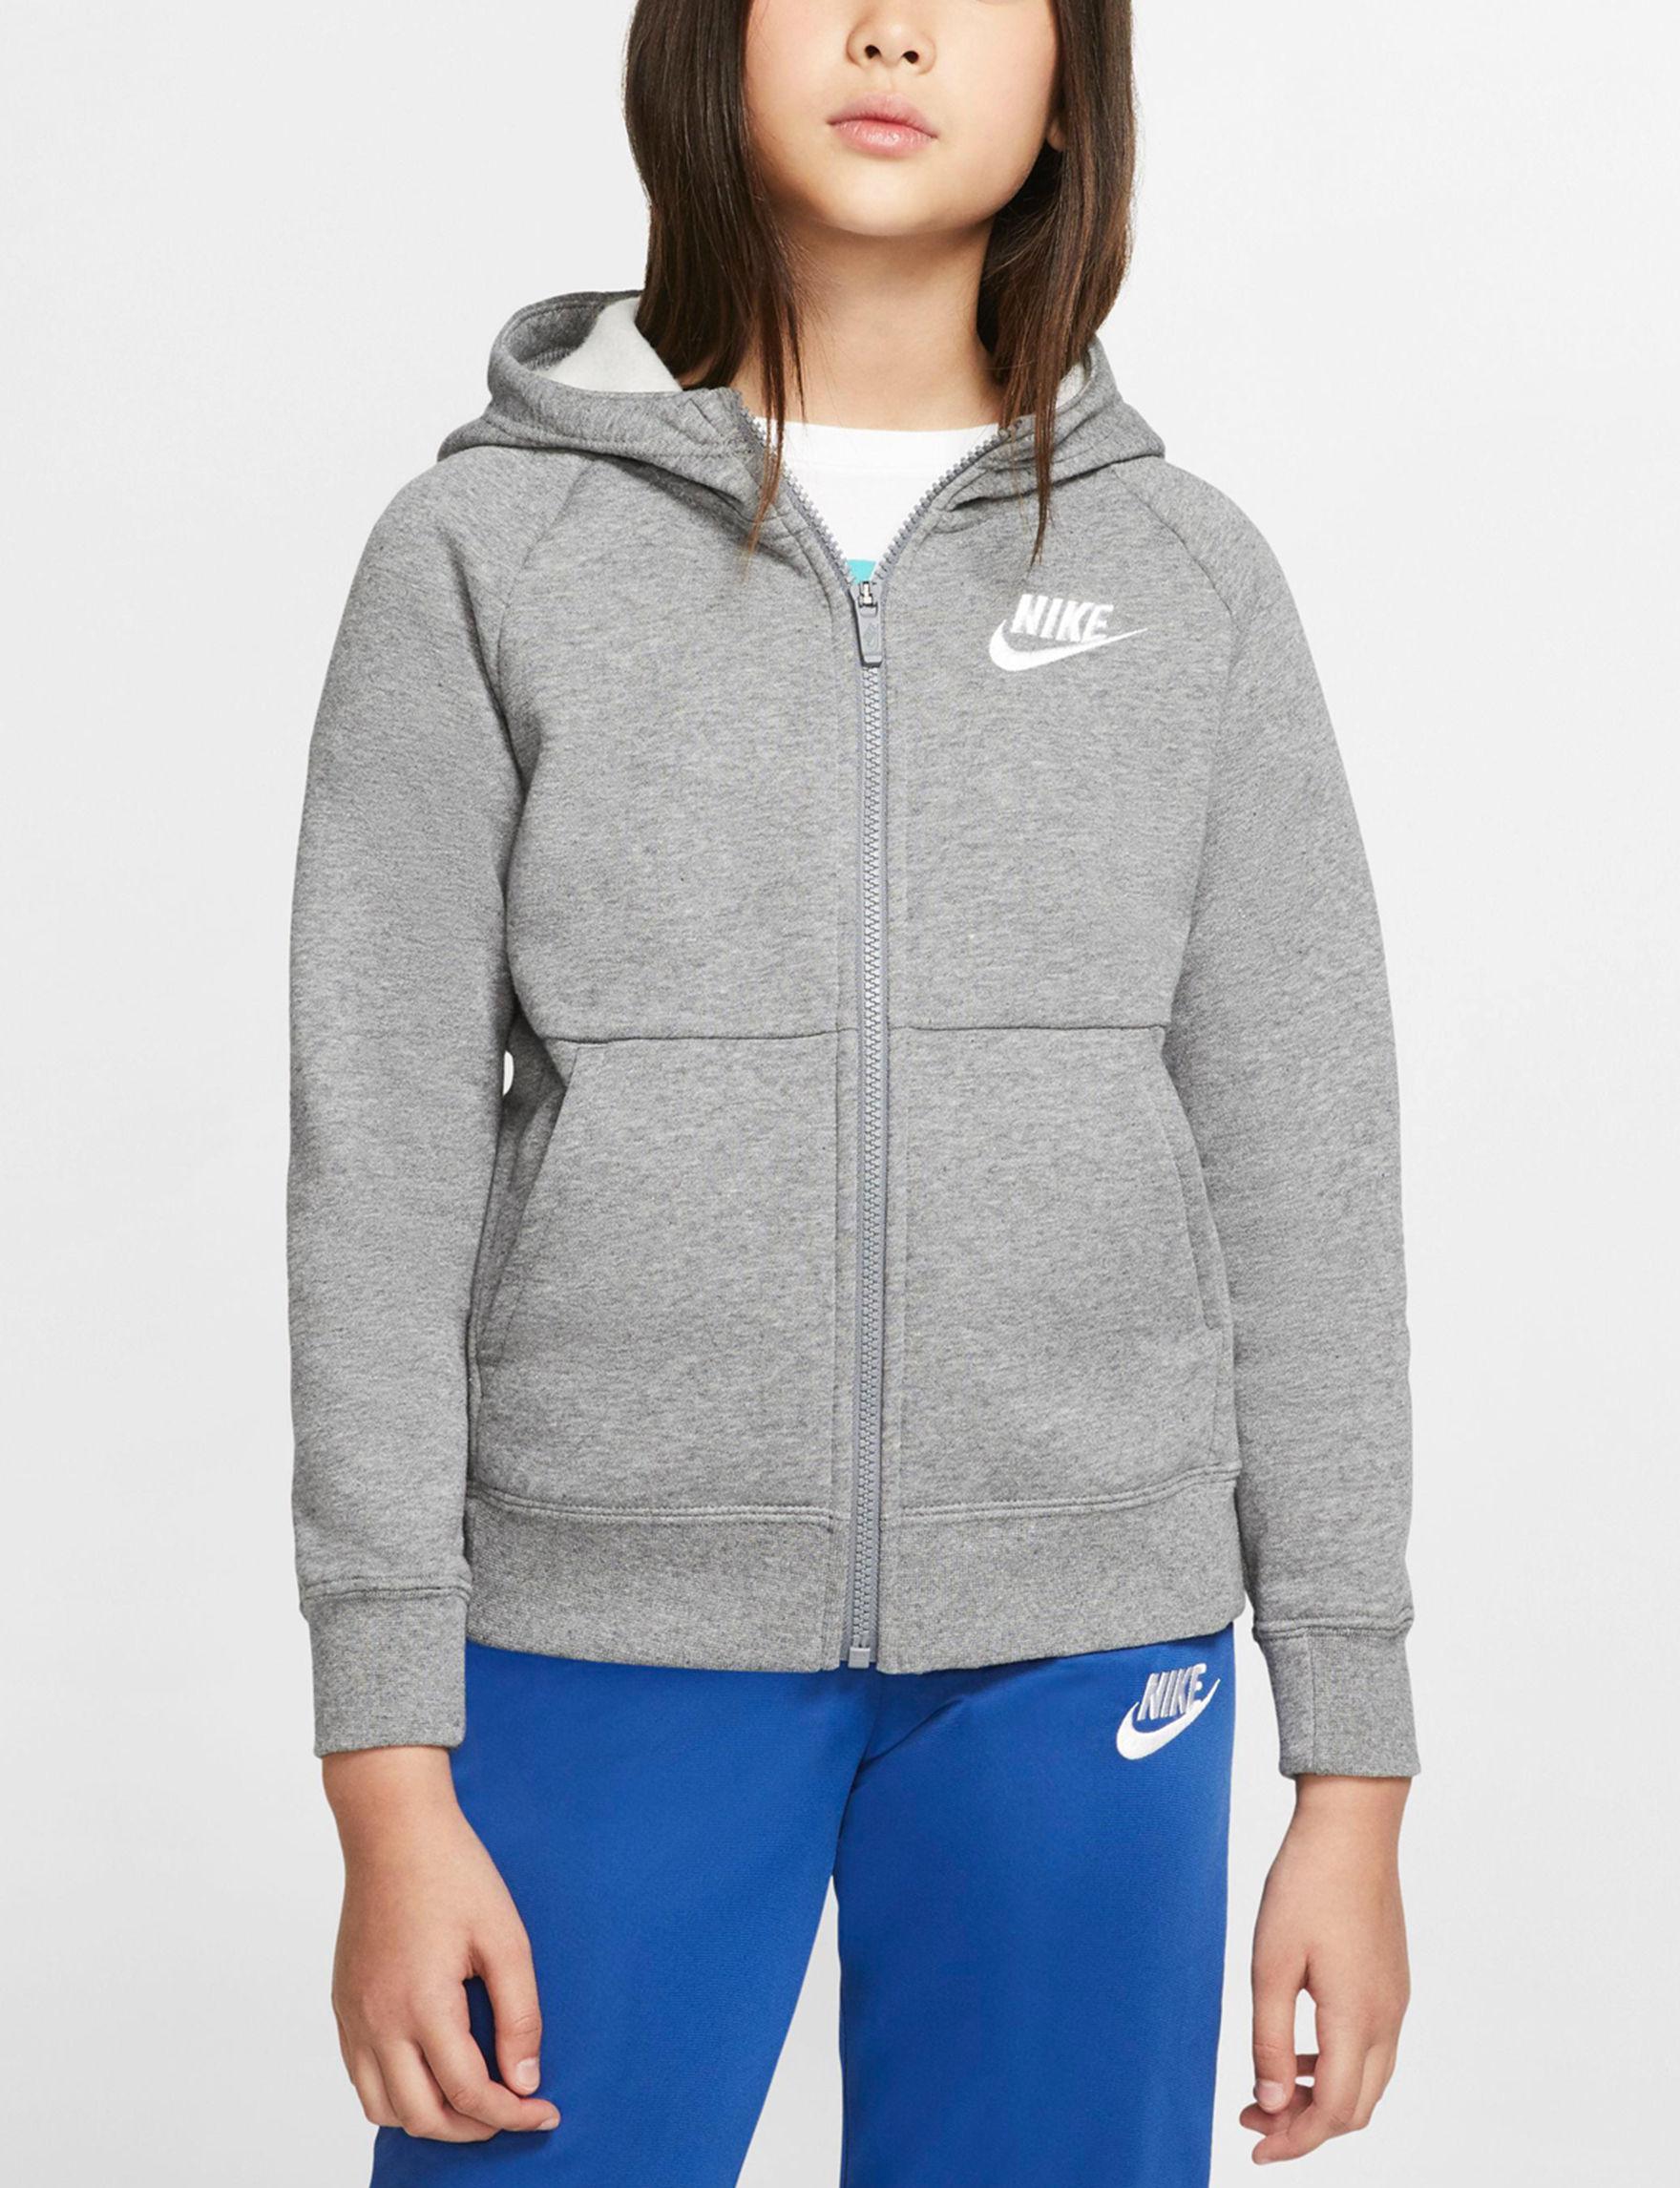 Nike Carbon Heather